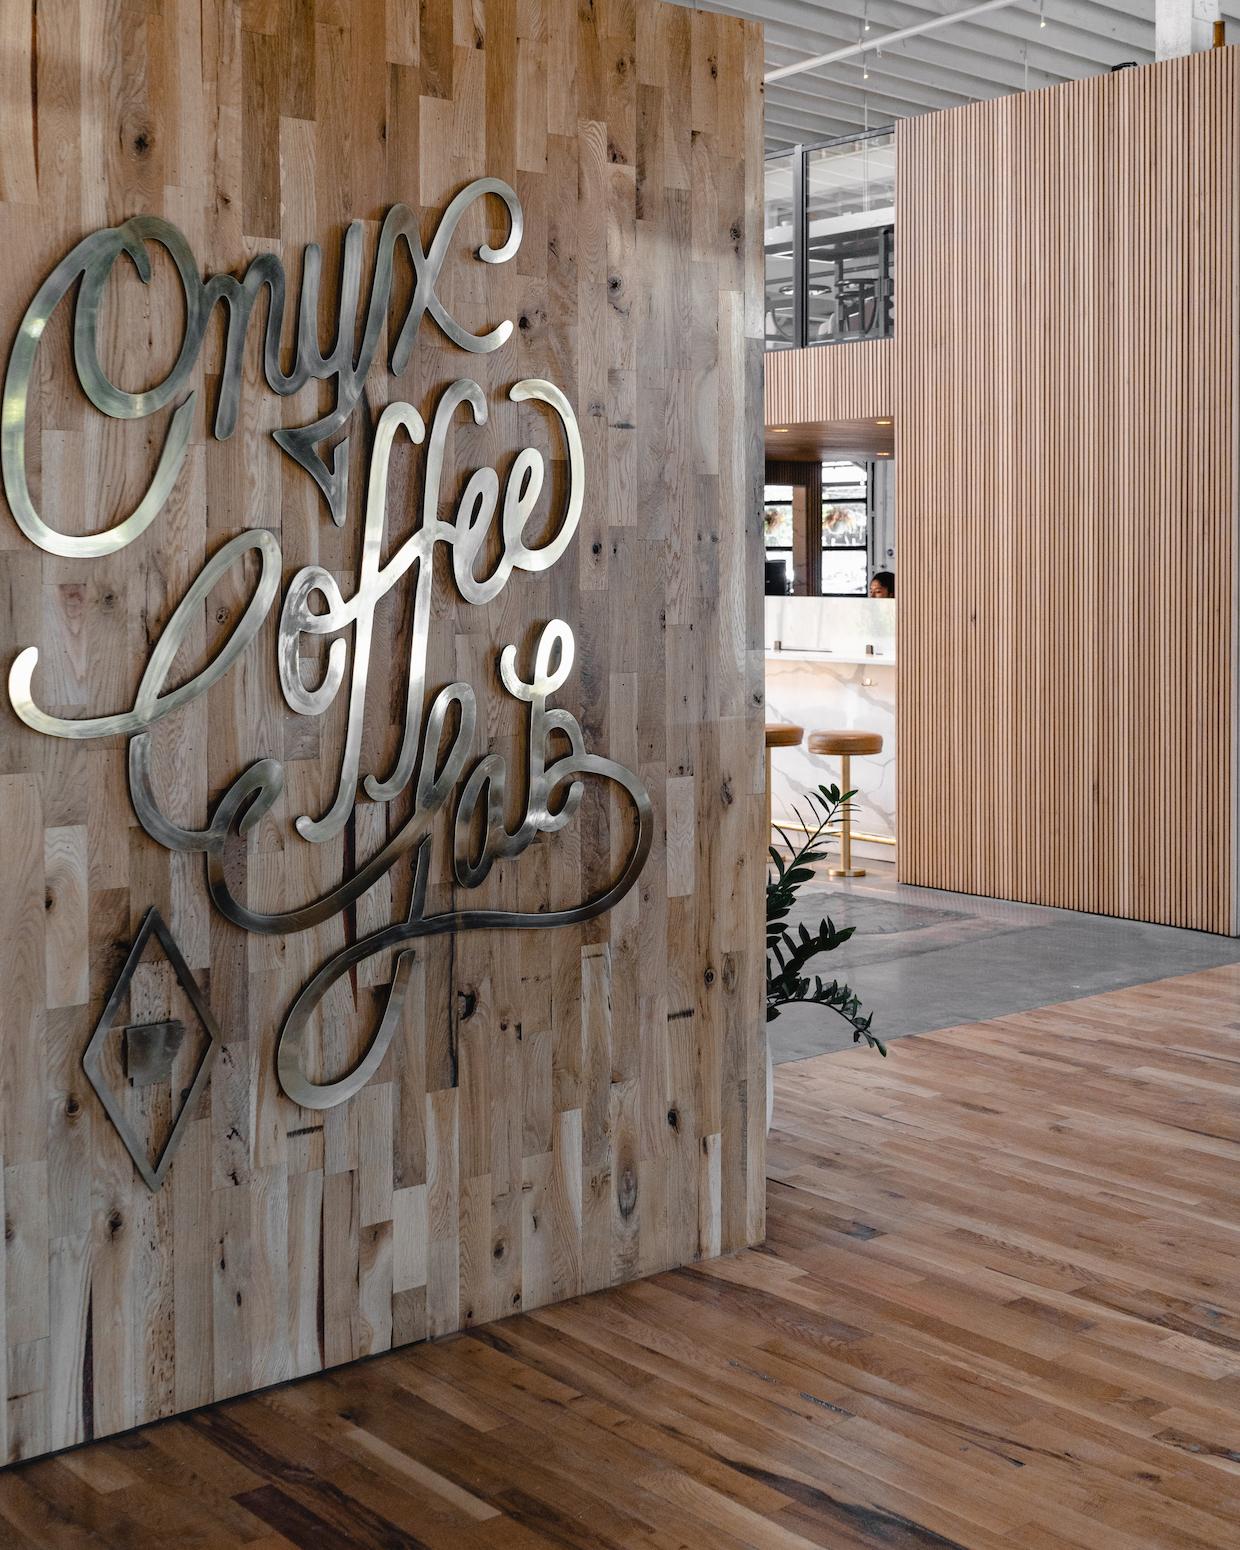 Onyx-Coffee-Lab